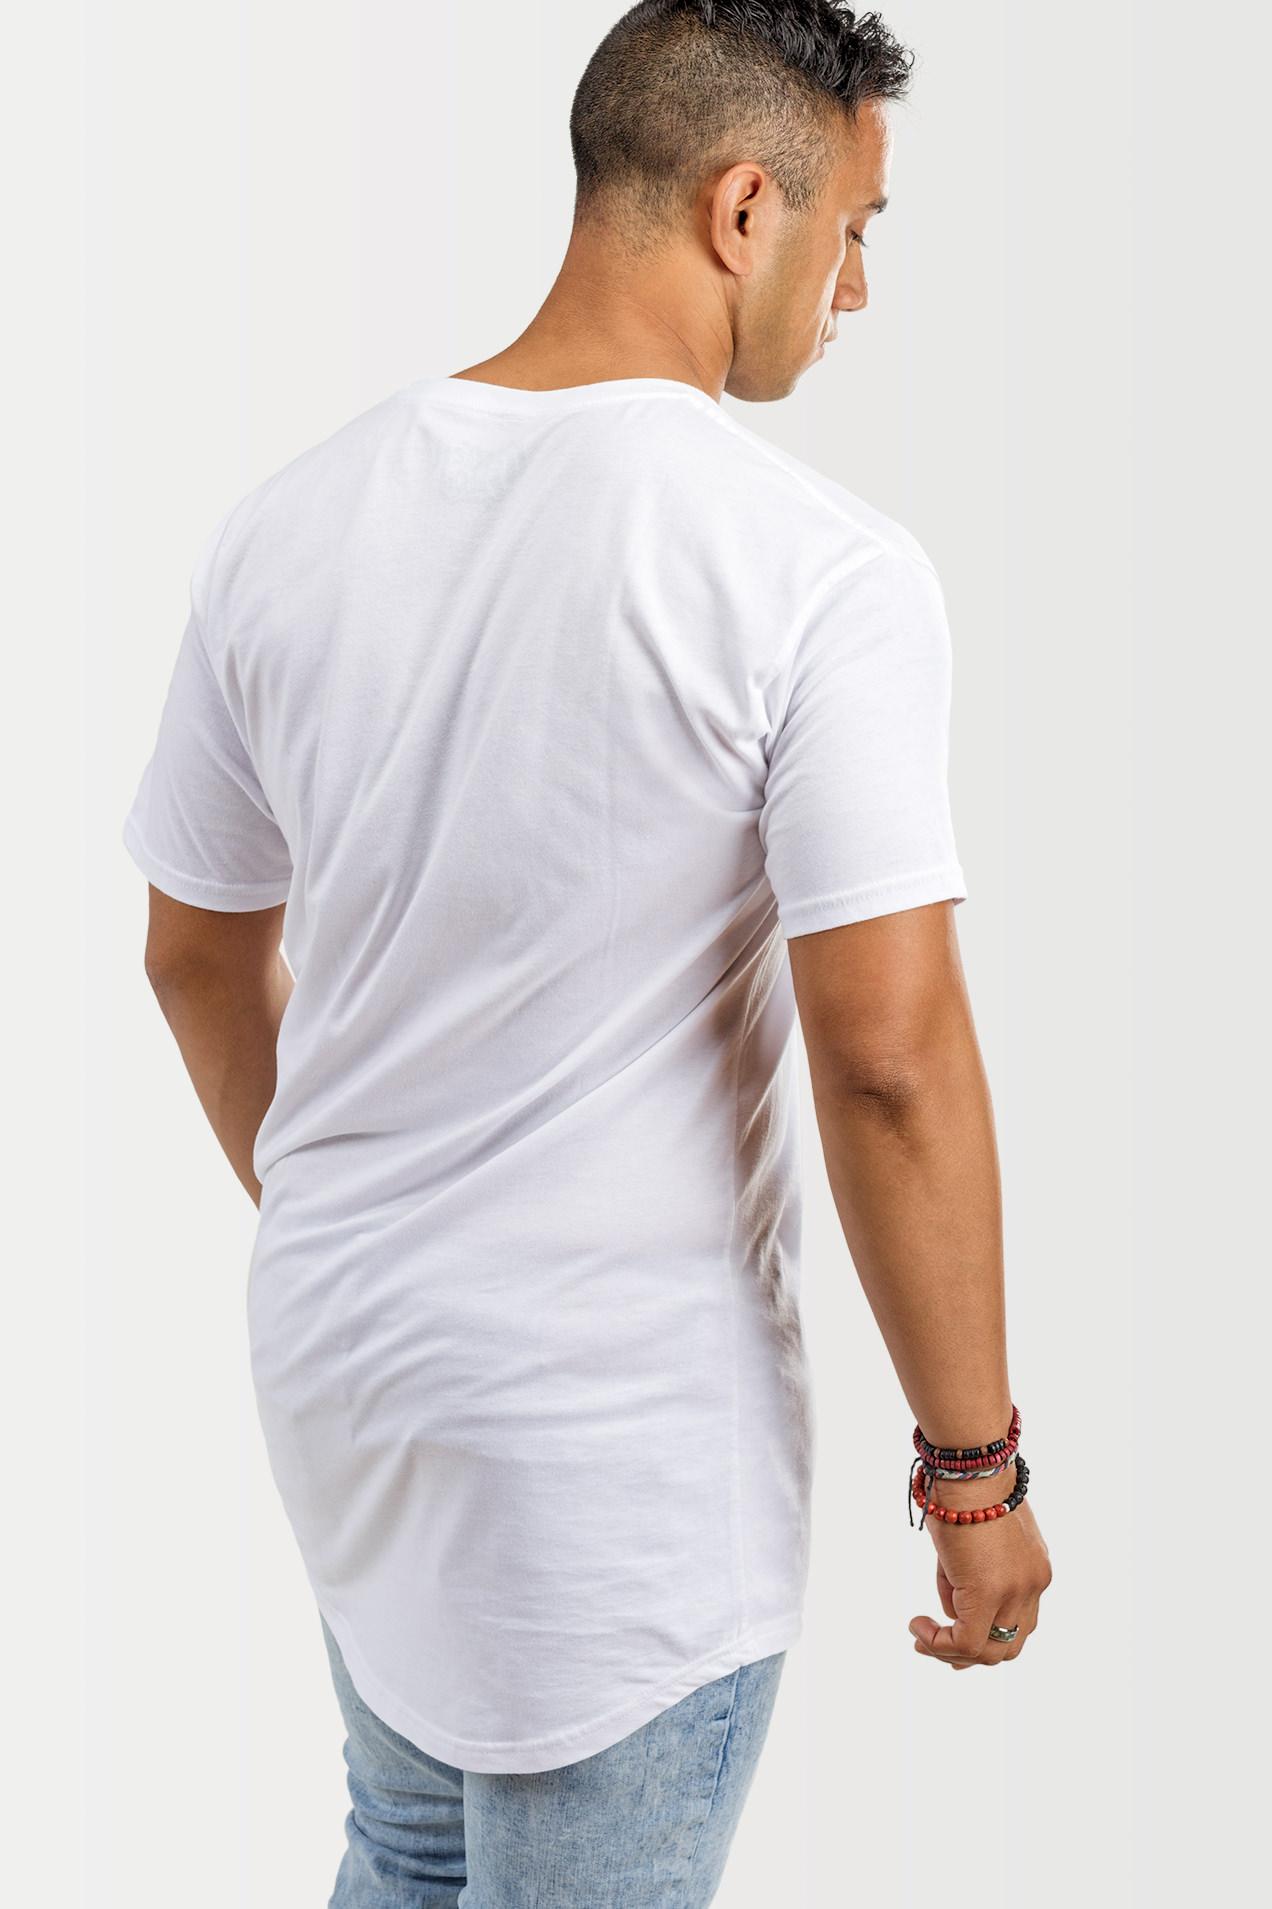 baa33d1ce46 Zouk X Long - Men s T-shirt - Motion Envy